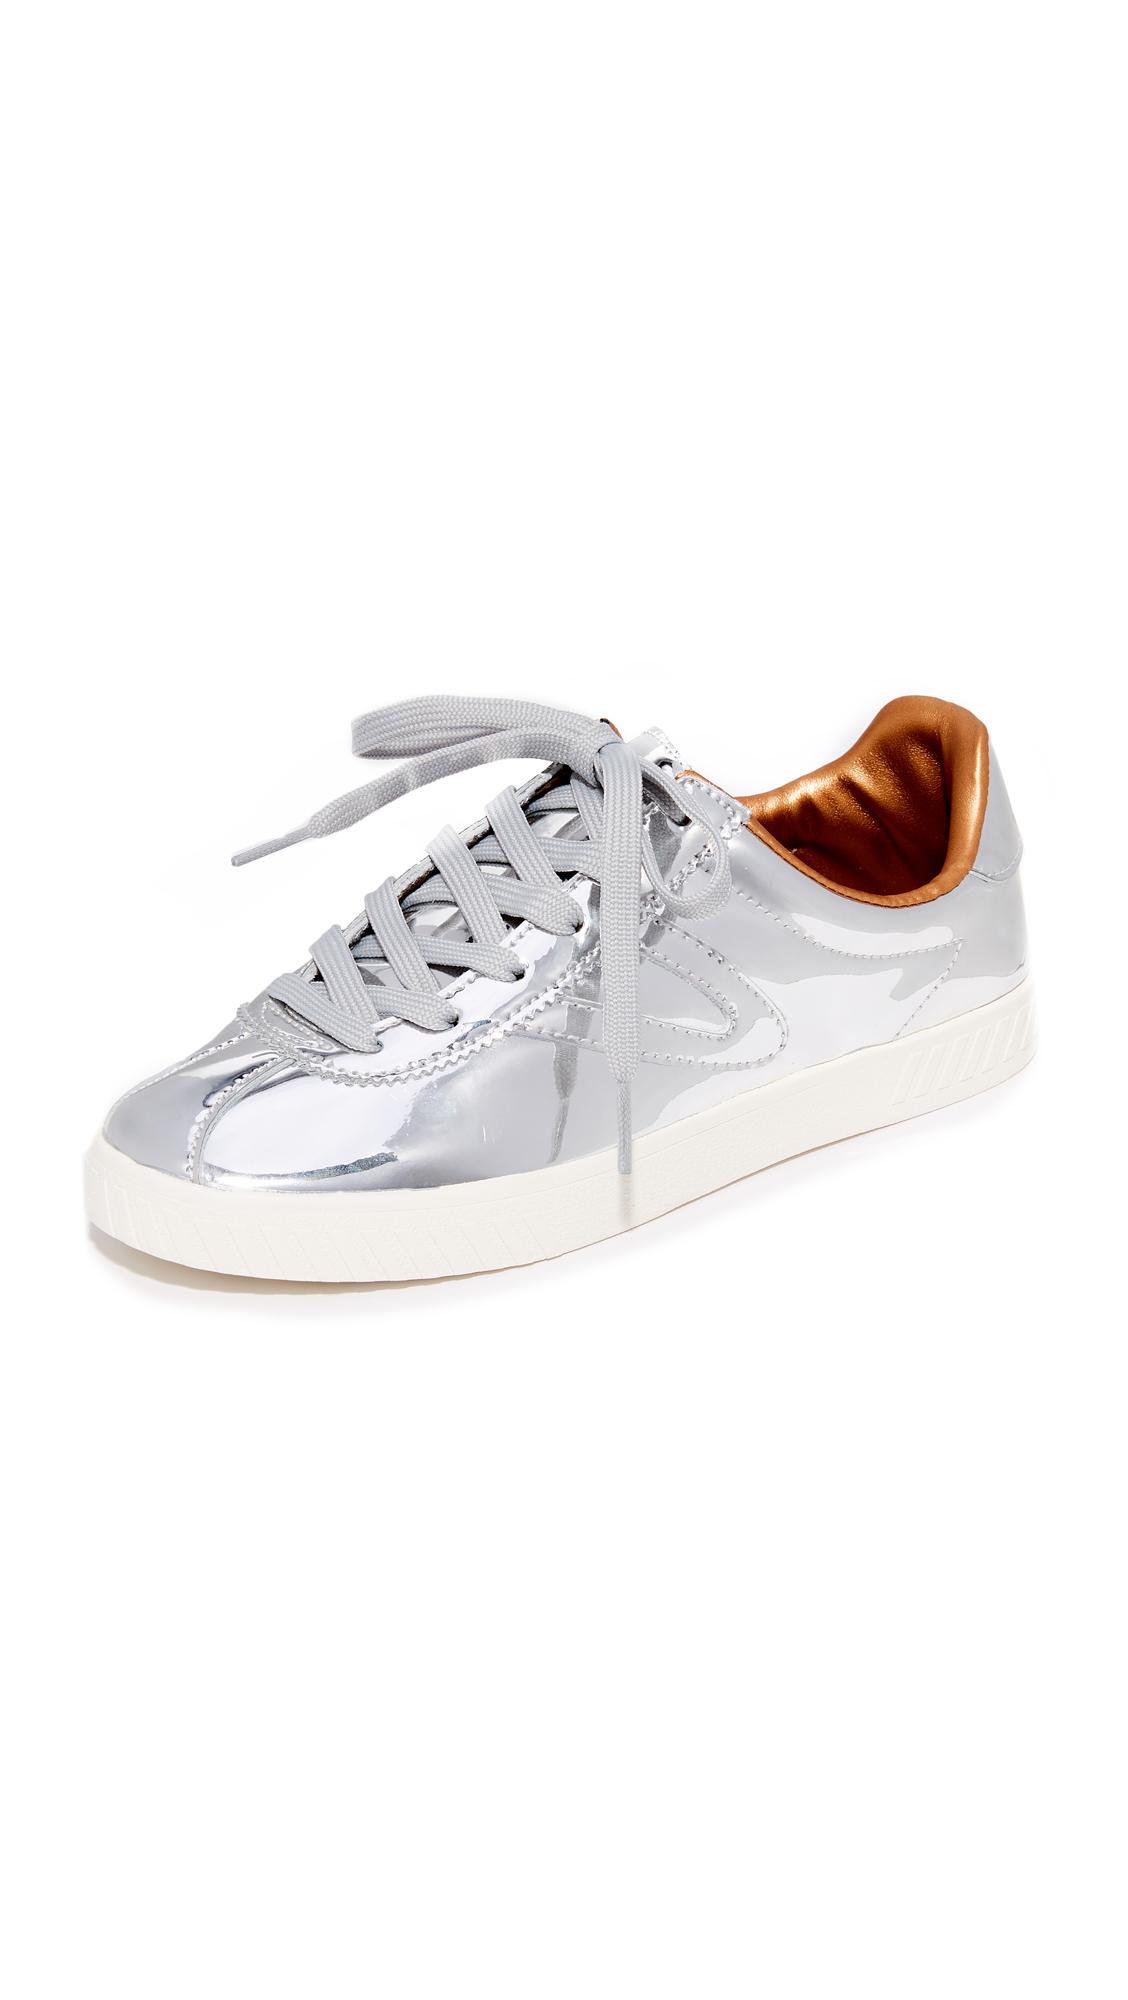 Tretorn Camden II Metallic Sneakers - Silver